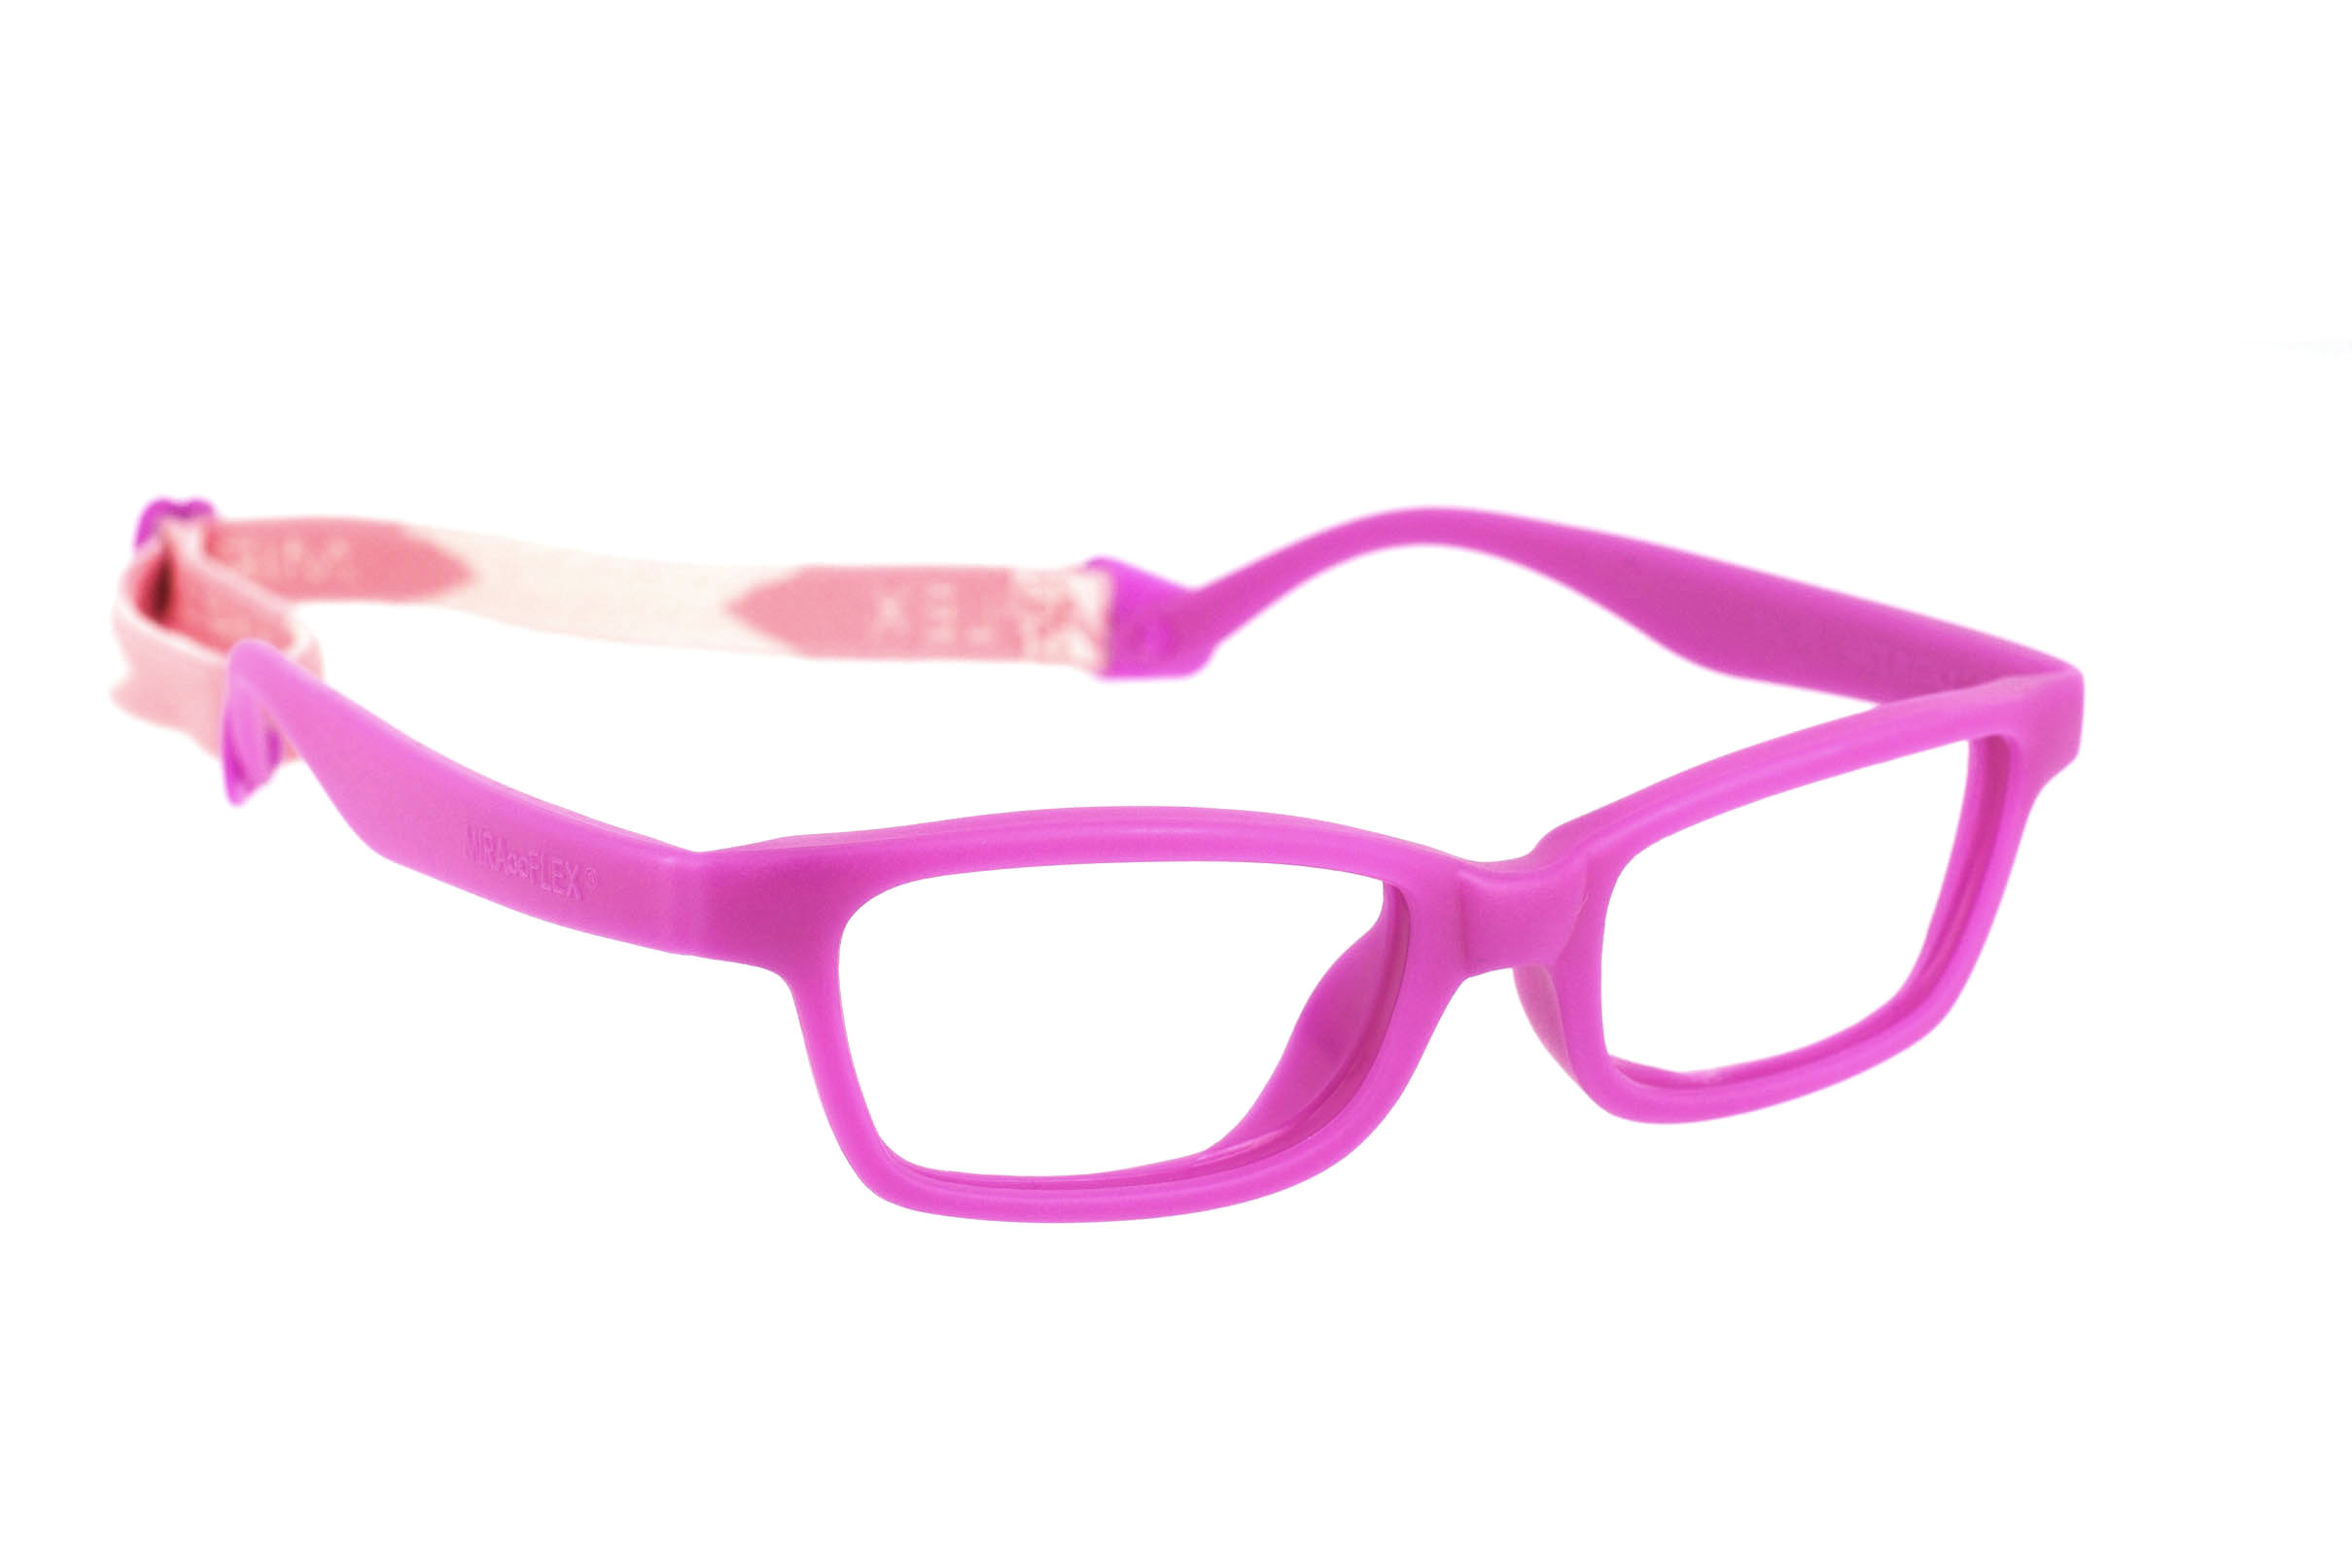 84b8d3e0380 Miraflex Mayan 39 Eyeglasses Magenta-BS Mayan 39-BS - Optiwow